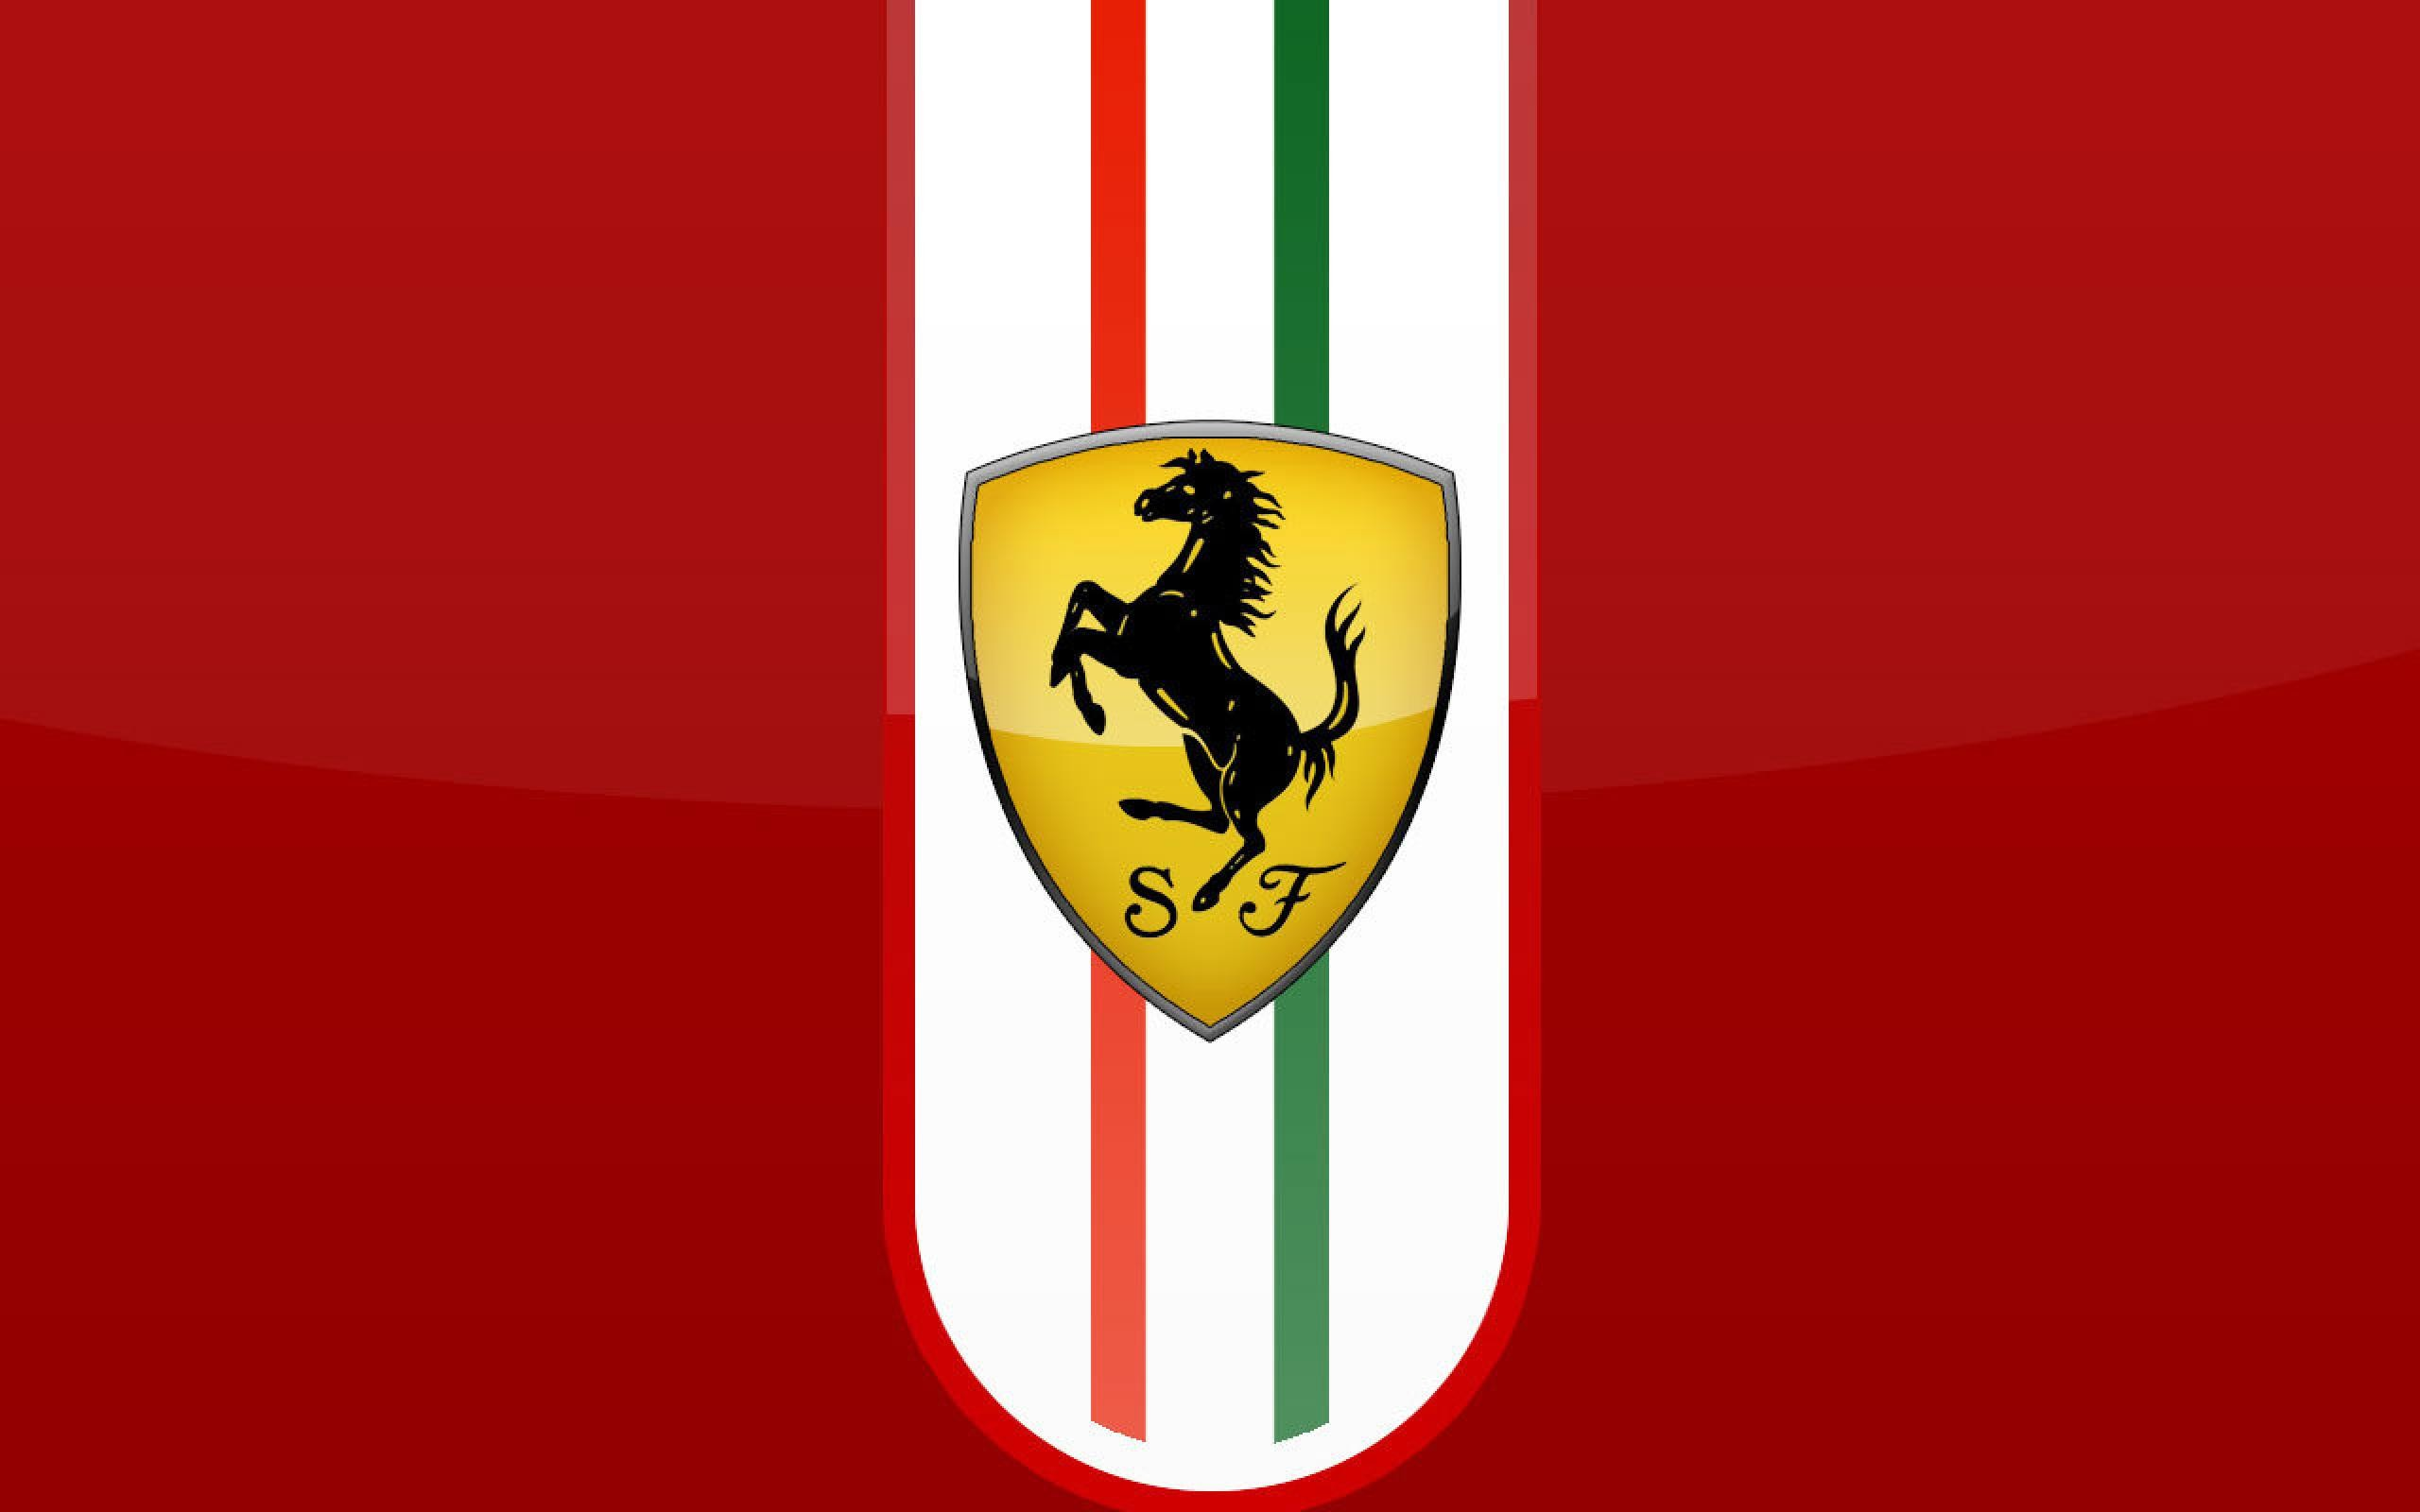 ferrari logo wallpaper (64+ images)